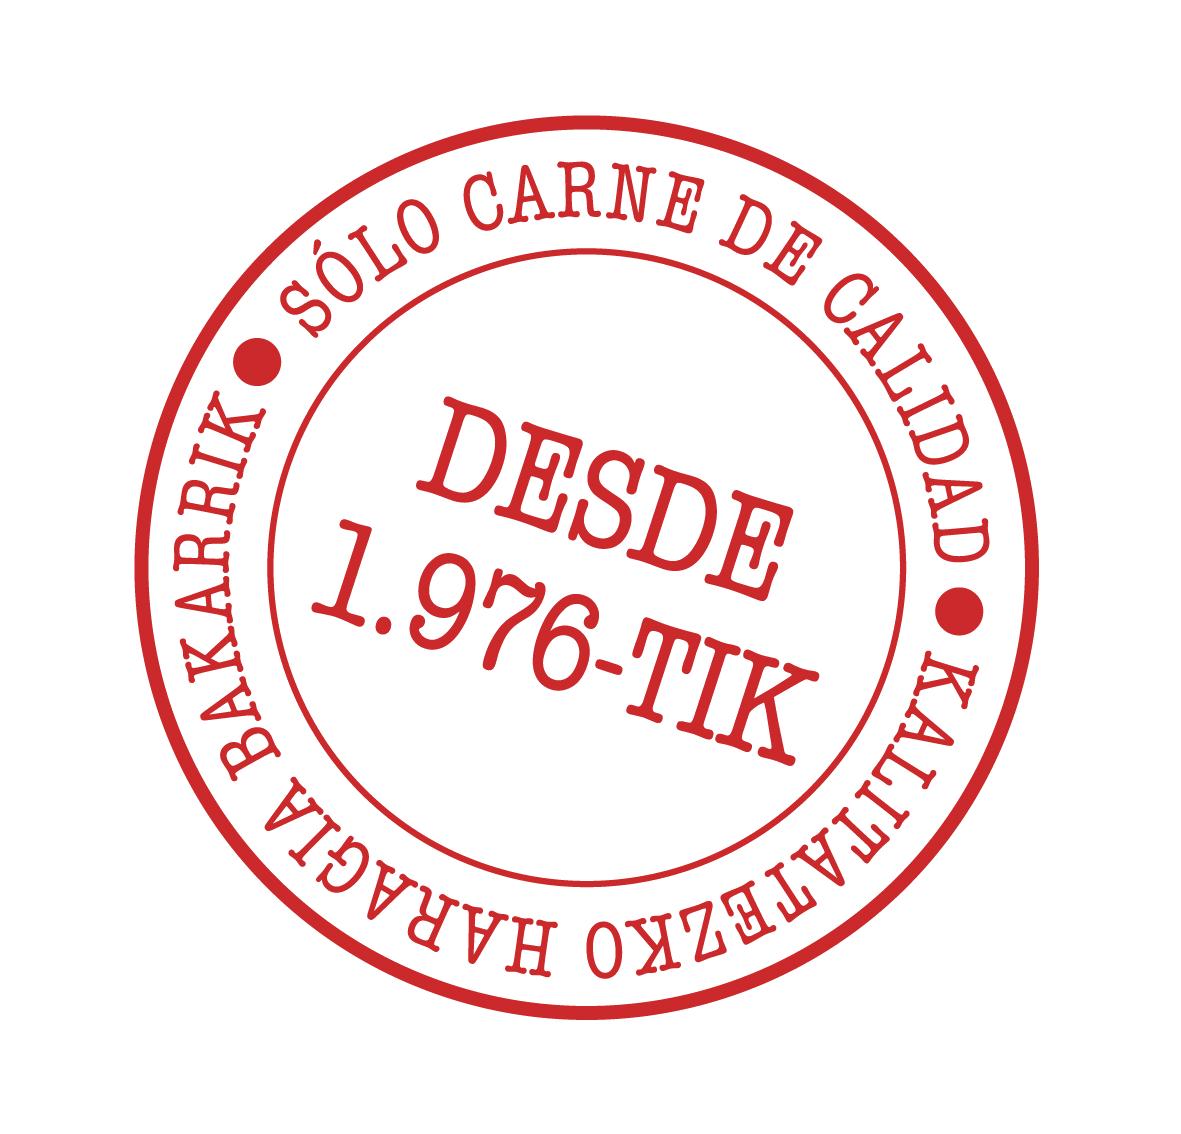 sello transparente Cárnicas Alejandro Goya Okelak